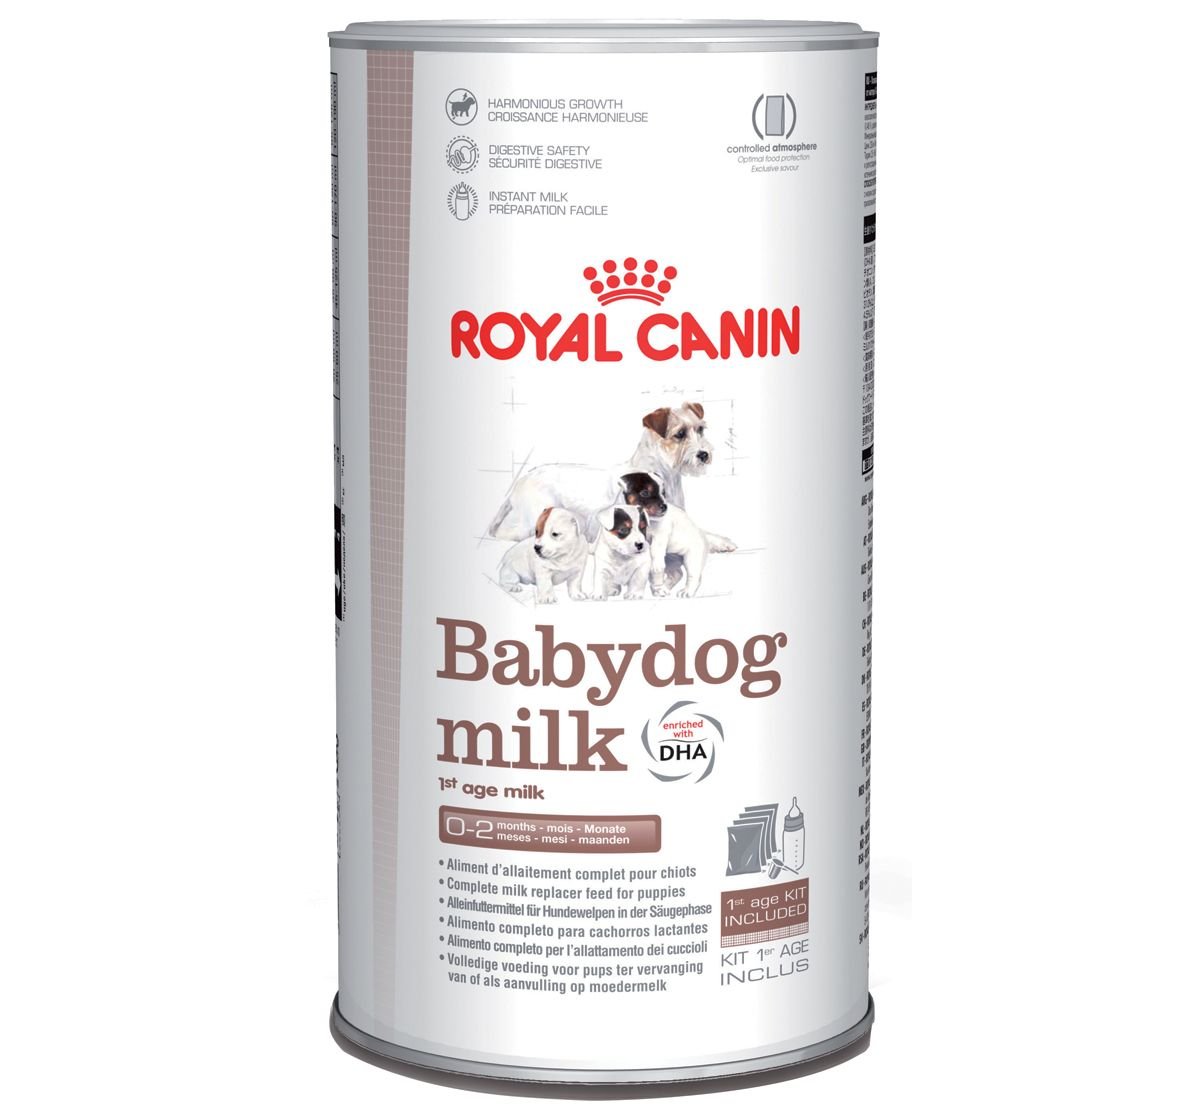 Royal Canin Baby Dog Milk For Puppies 400 Gms Dog Milk Dog Food Recipes Royal Canin